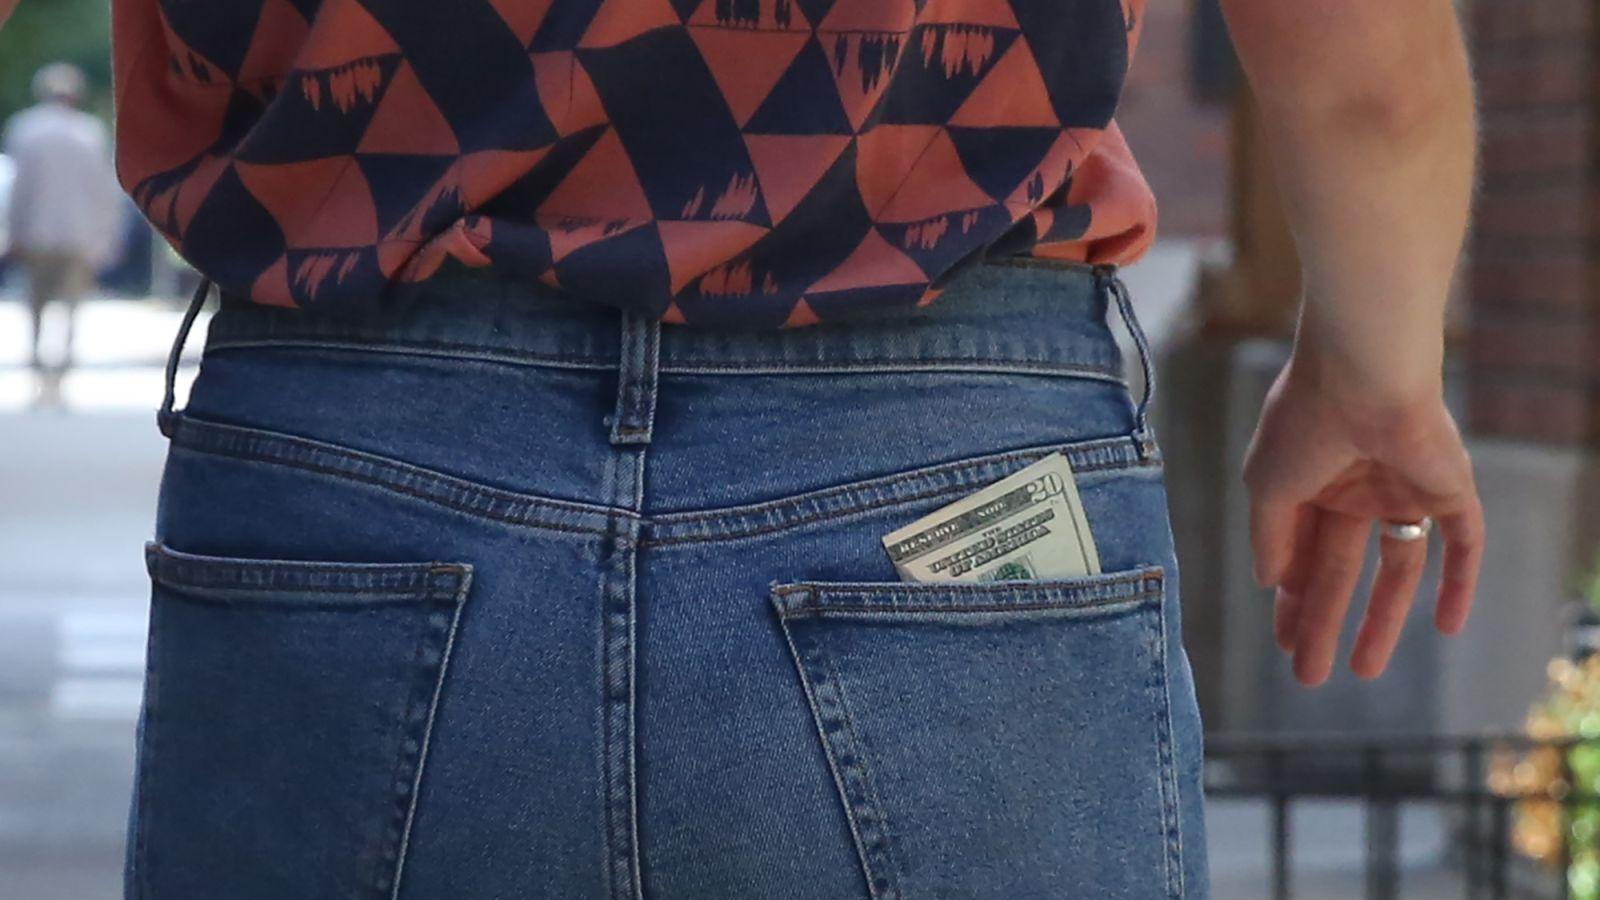 $20 Bill Slowly But Surely Wriggling Free From Back Pocket https://t.co/faJmnVIDE8 https://t.co/SHsQFwbFVH